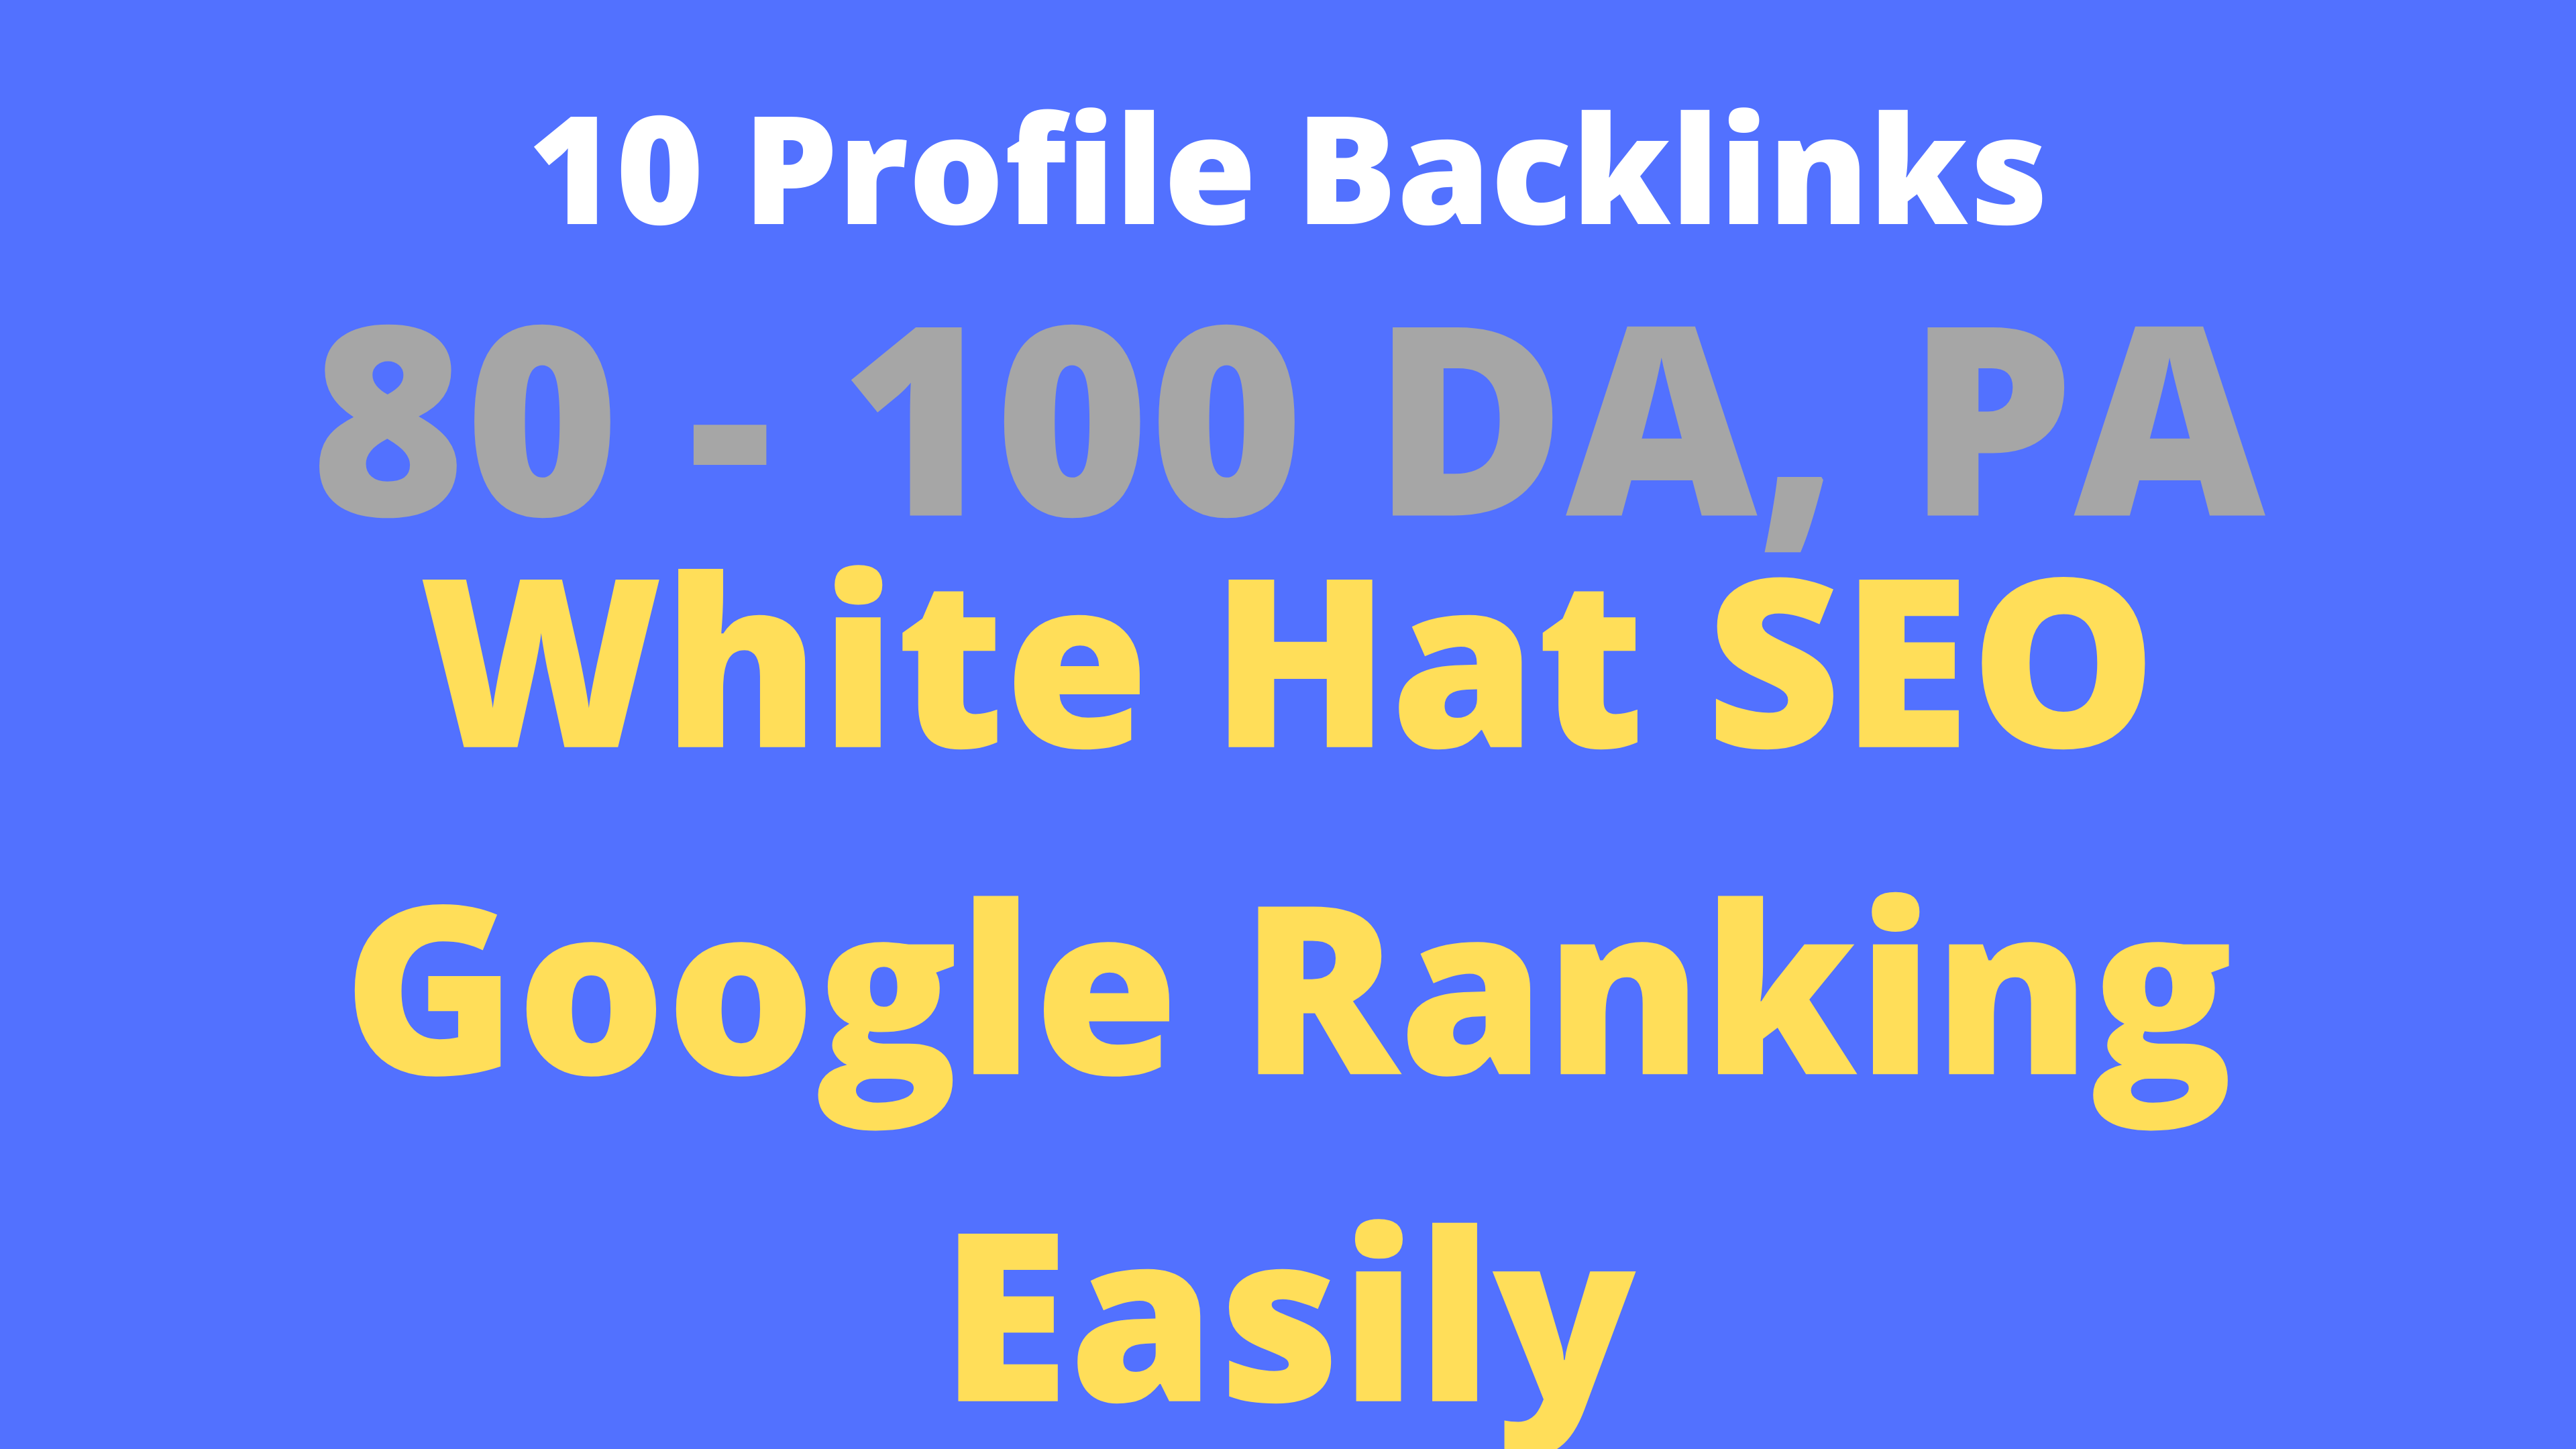 10 White Hat SEO Profile Backlilnk High DA PA Sites